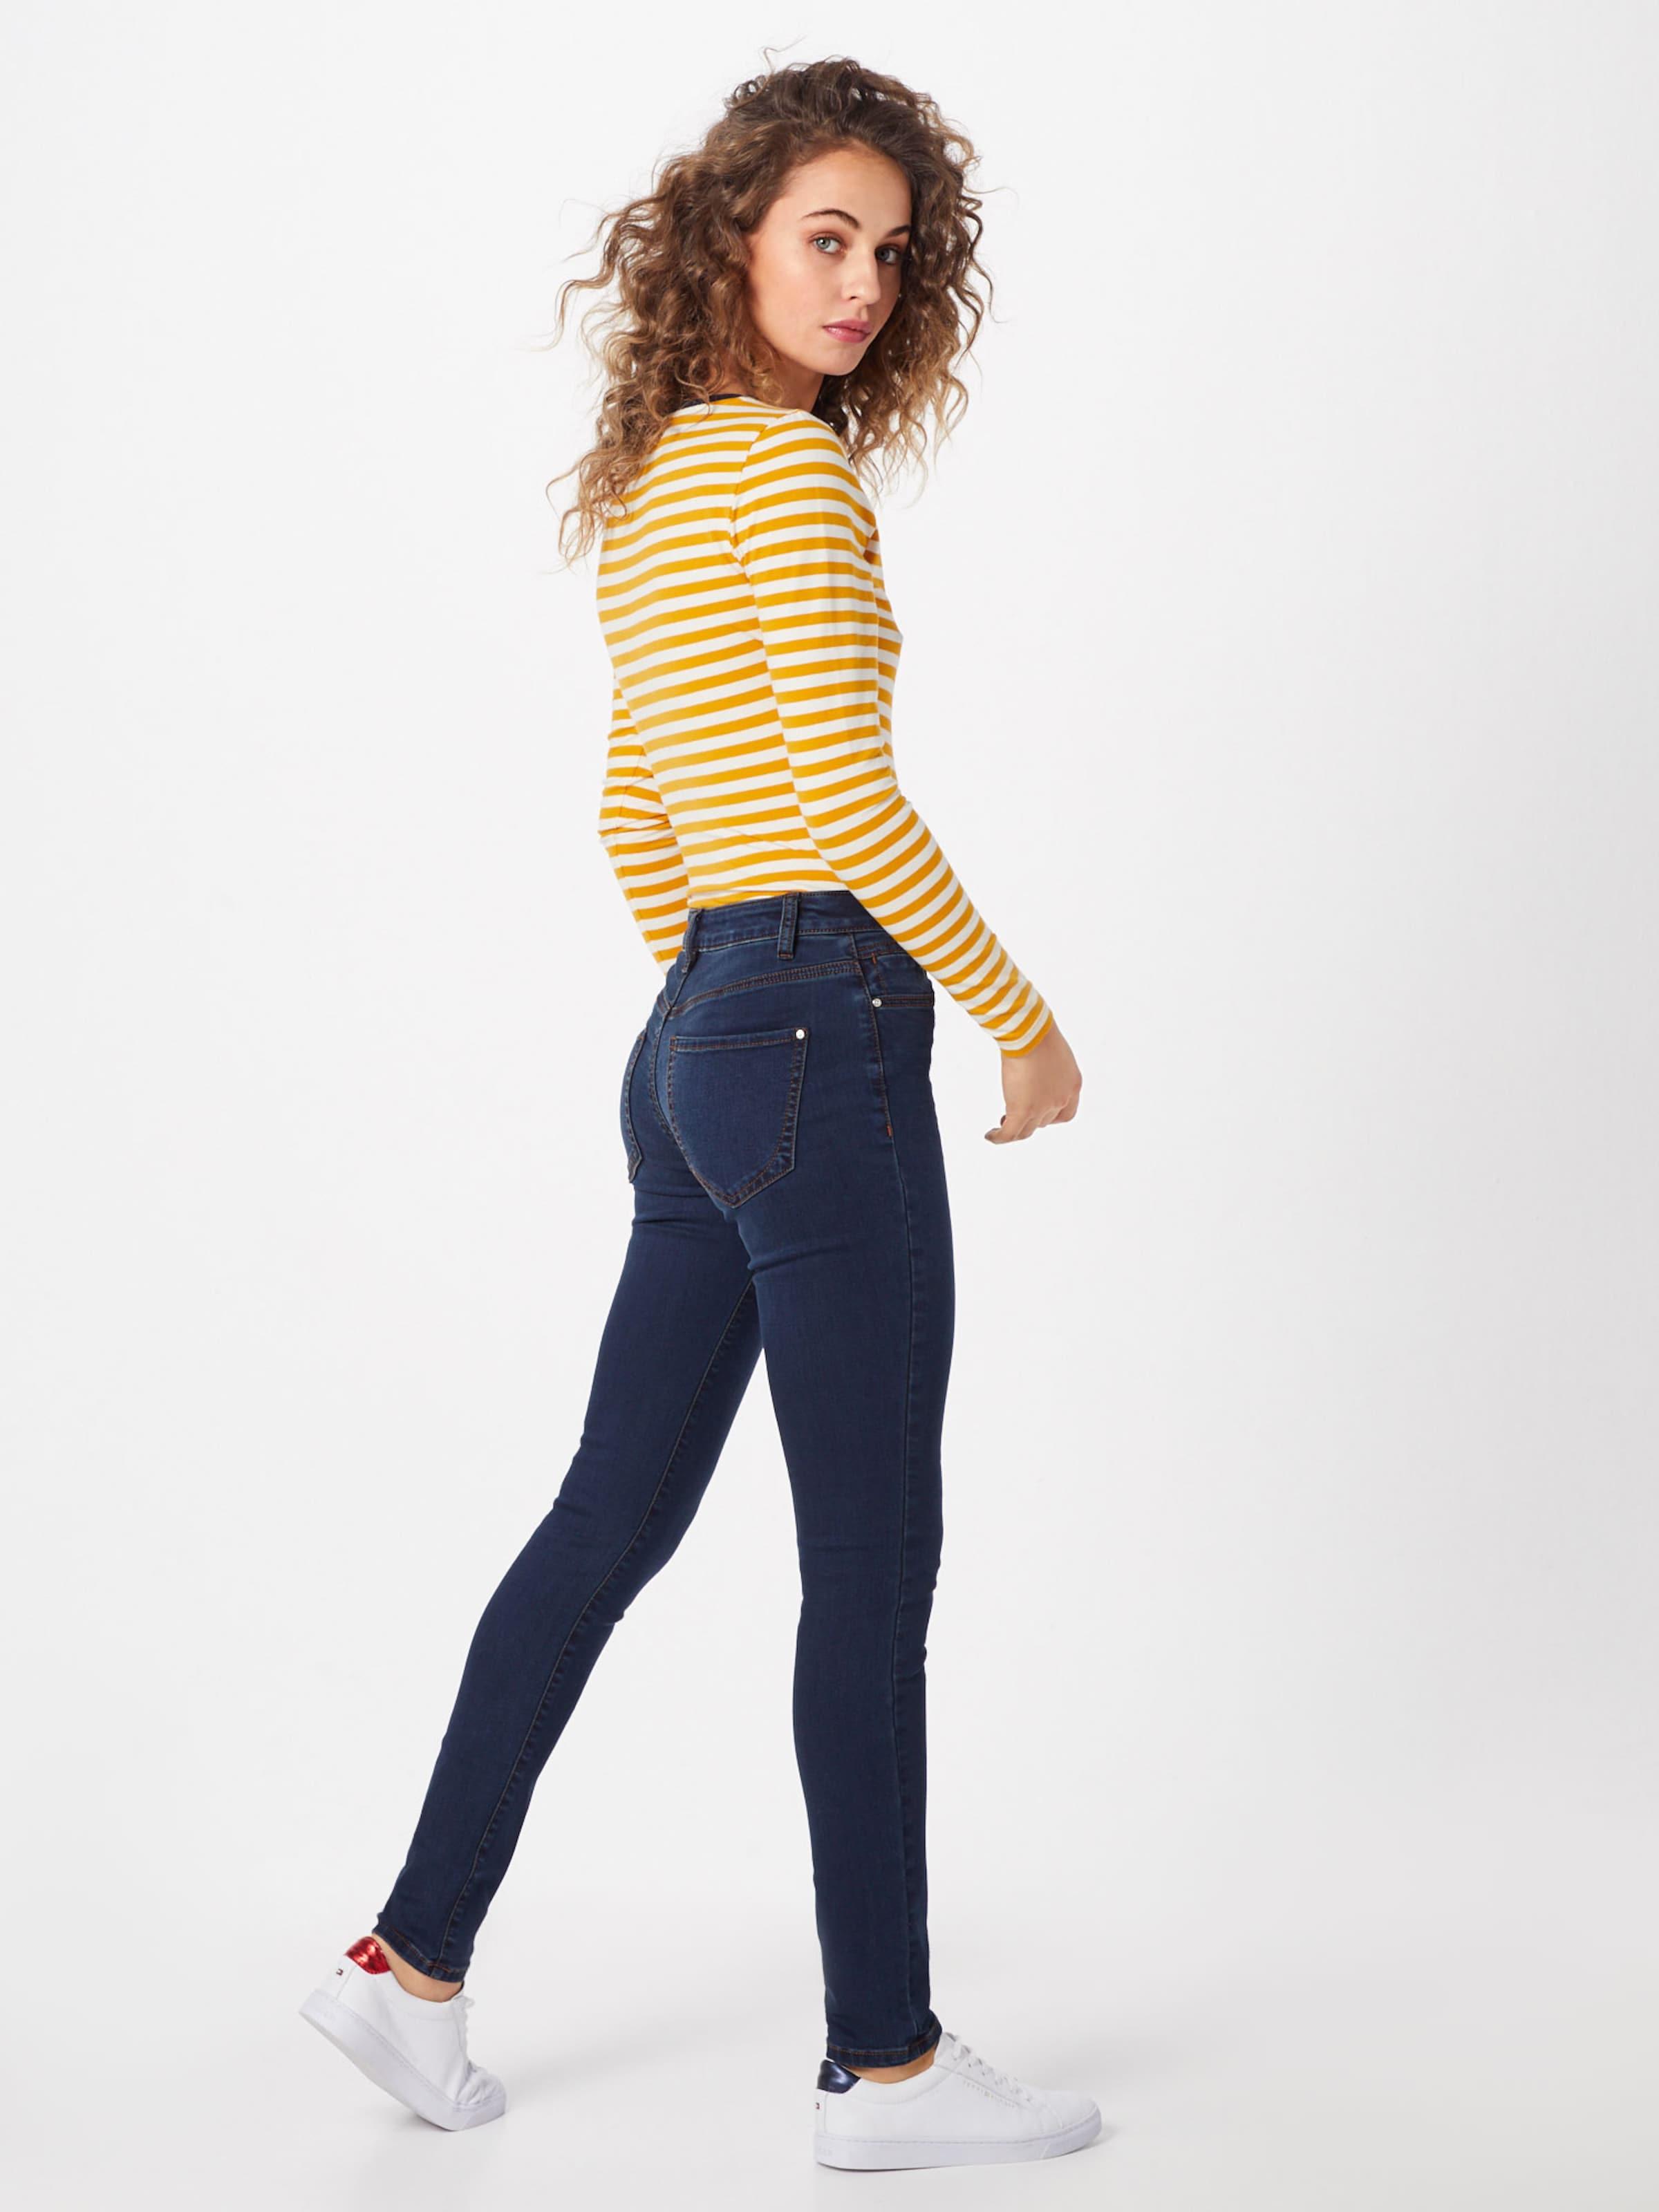 'kate' Jeans Denim Tailor Tom In IndigoBlue sdCthQr